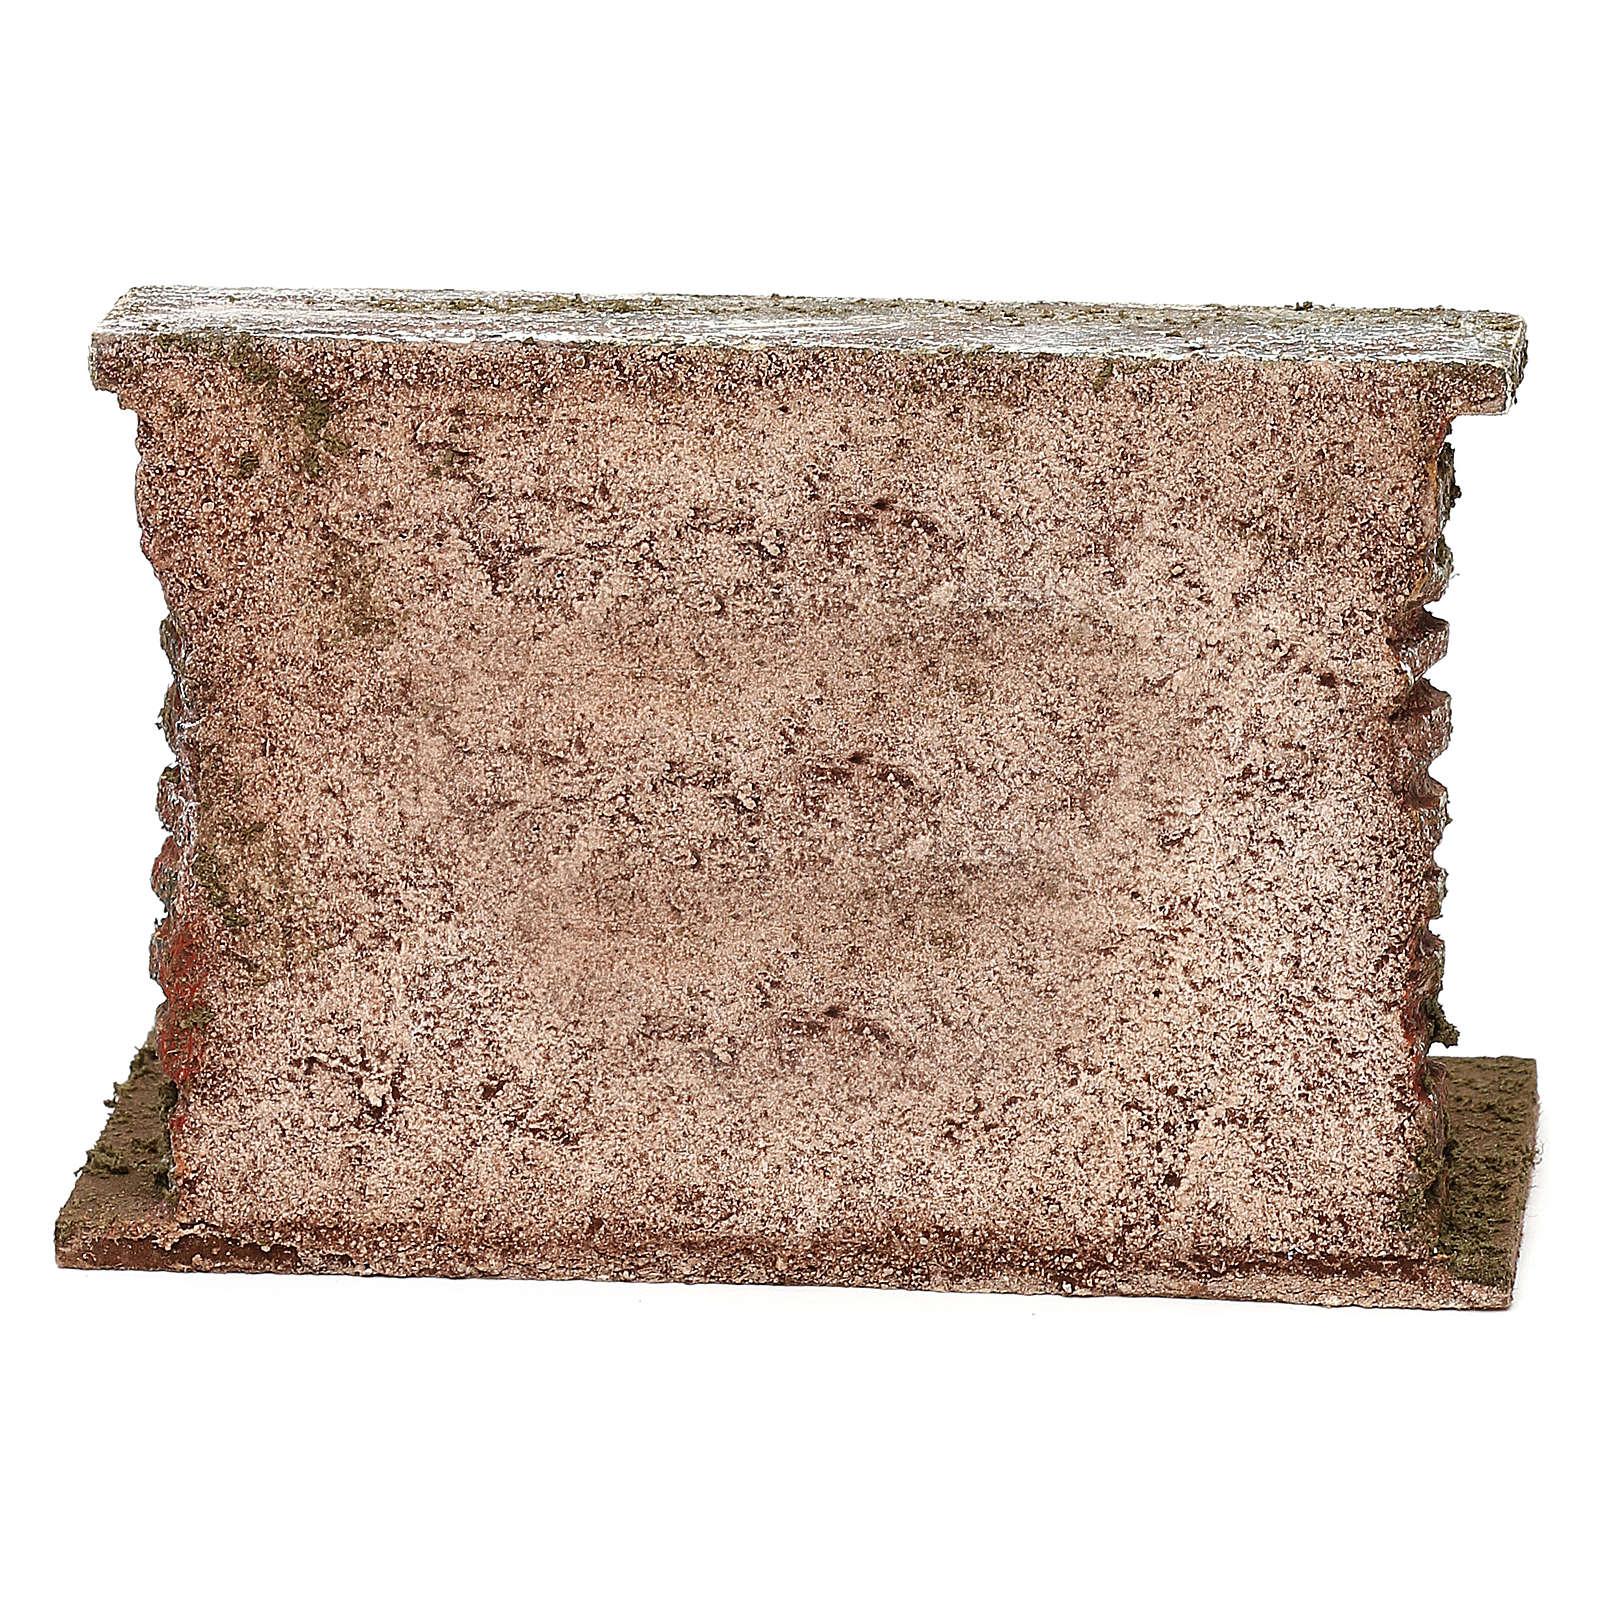 Botti adagiate al muro presepe 12 cm ambientazione 10x15x5 cm 4